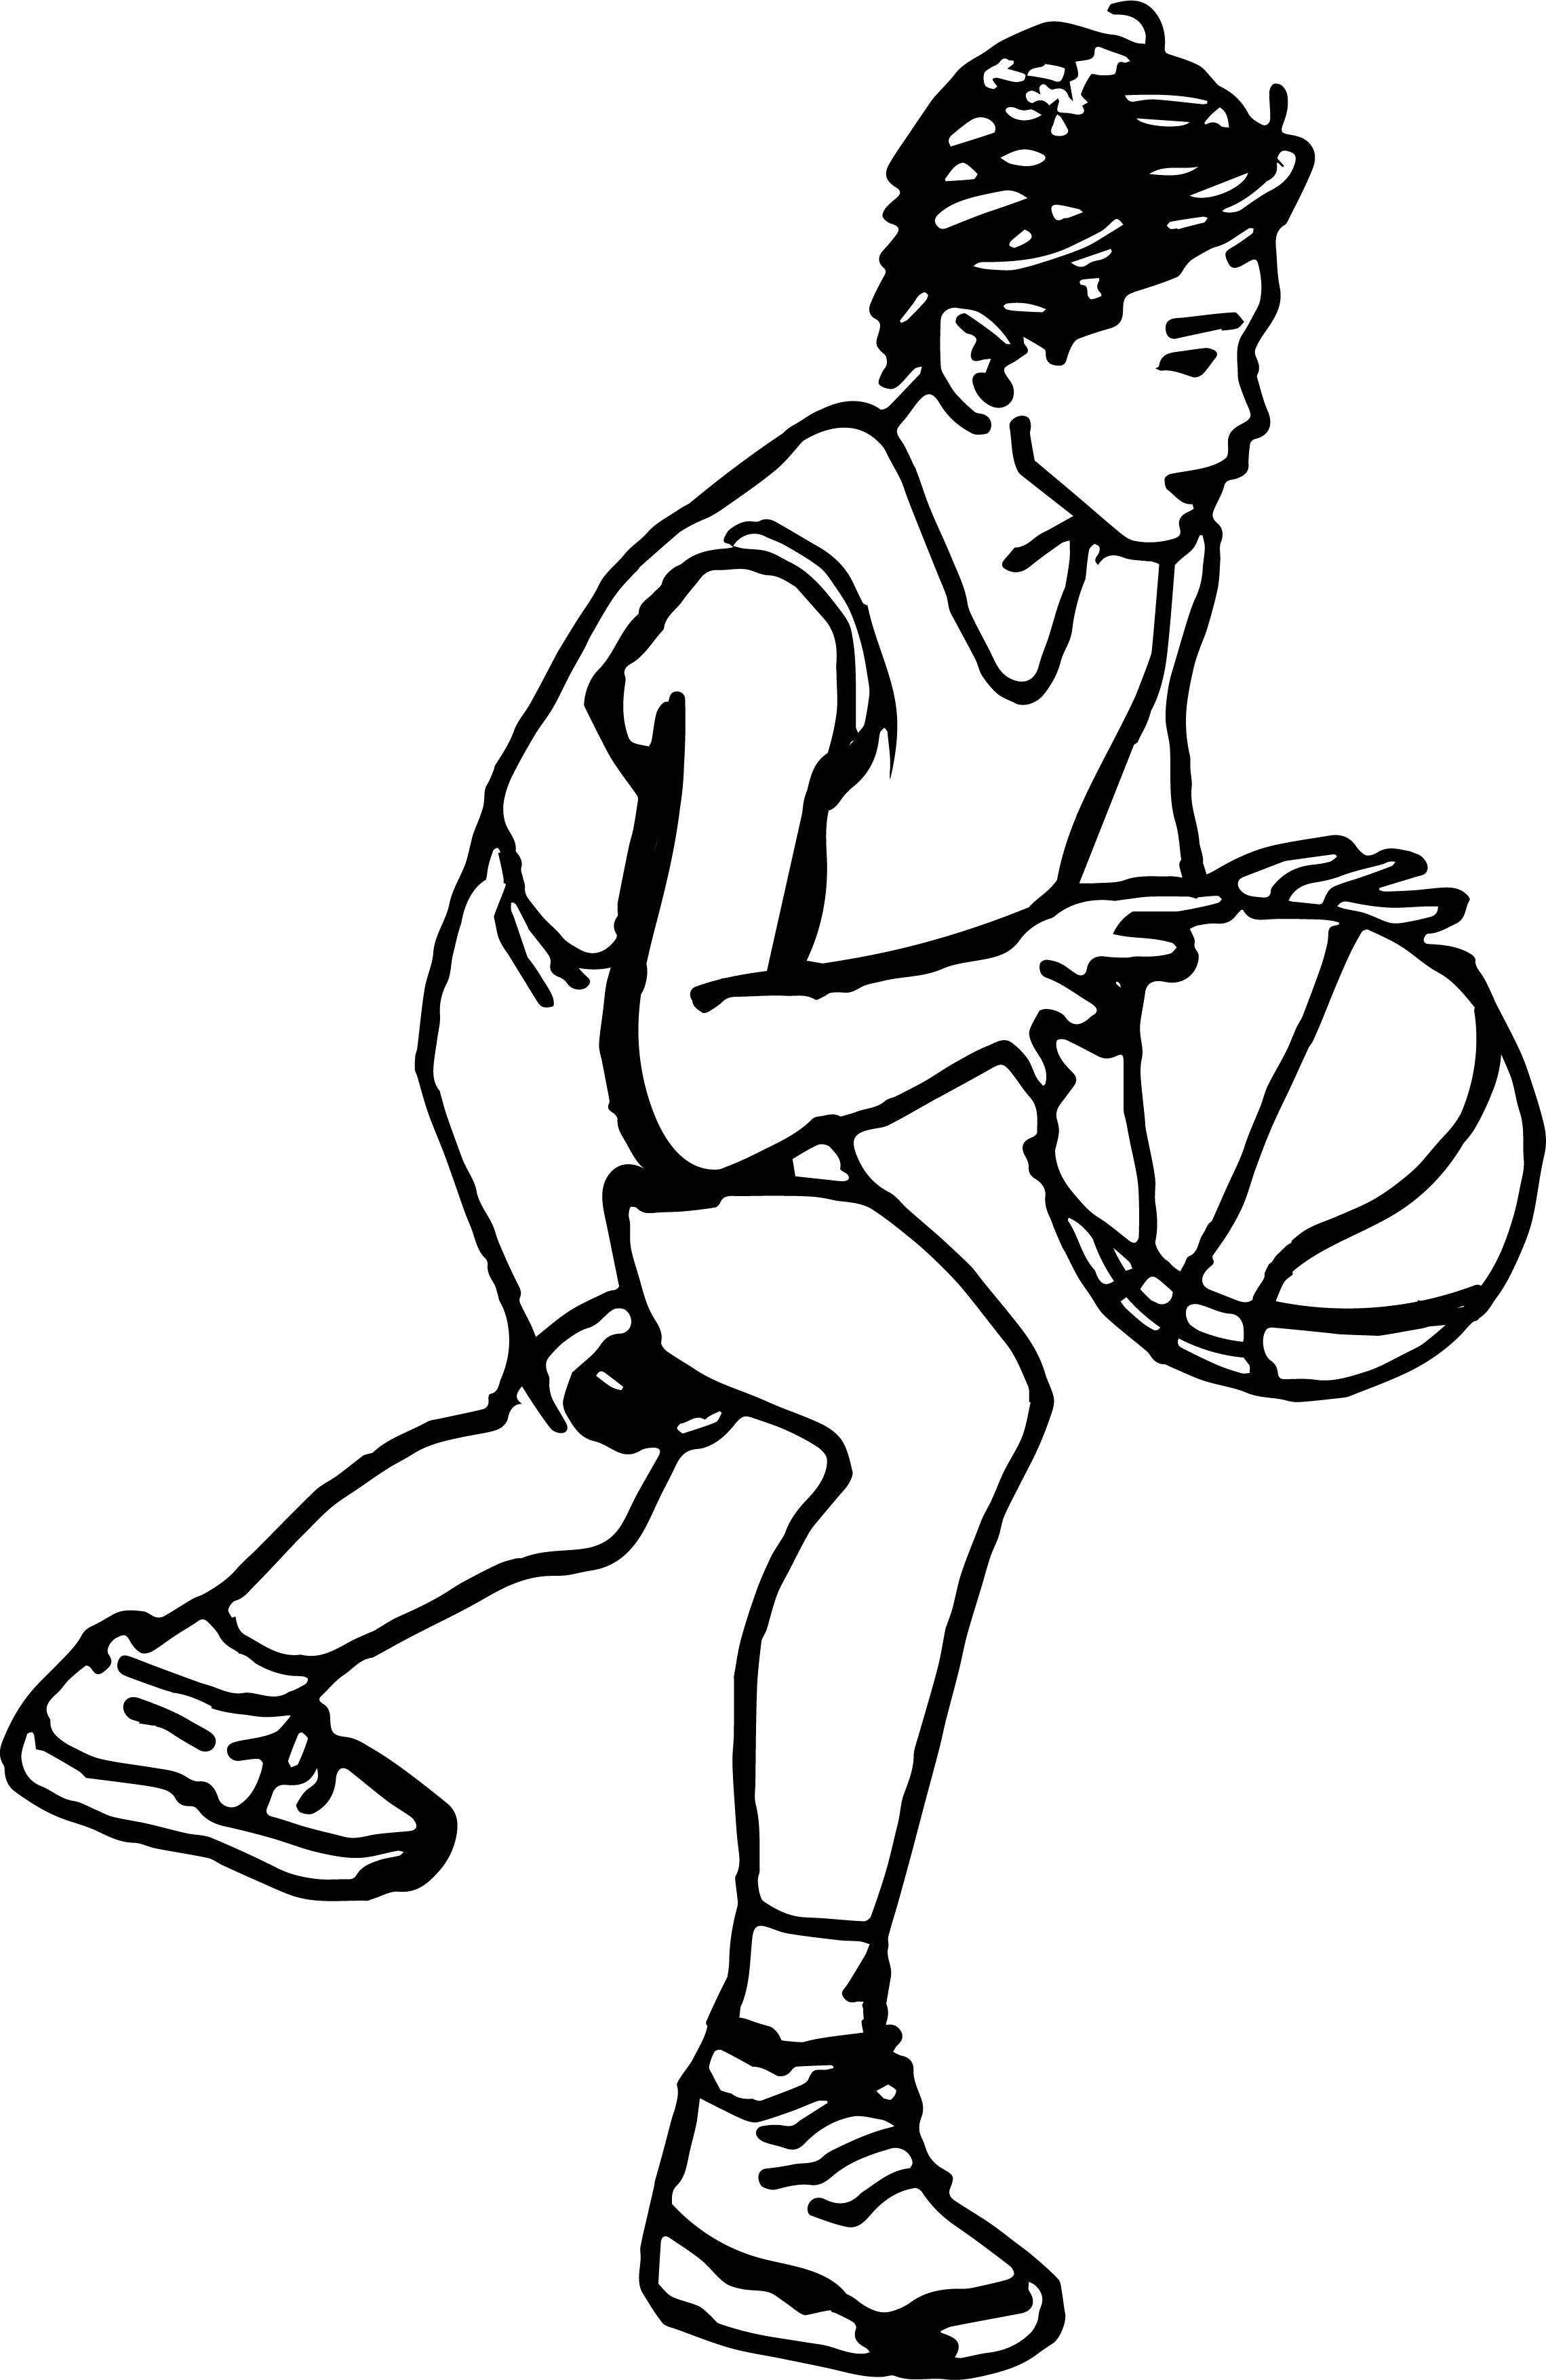 Cartoon Boy Playing Basketball Coloring Page